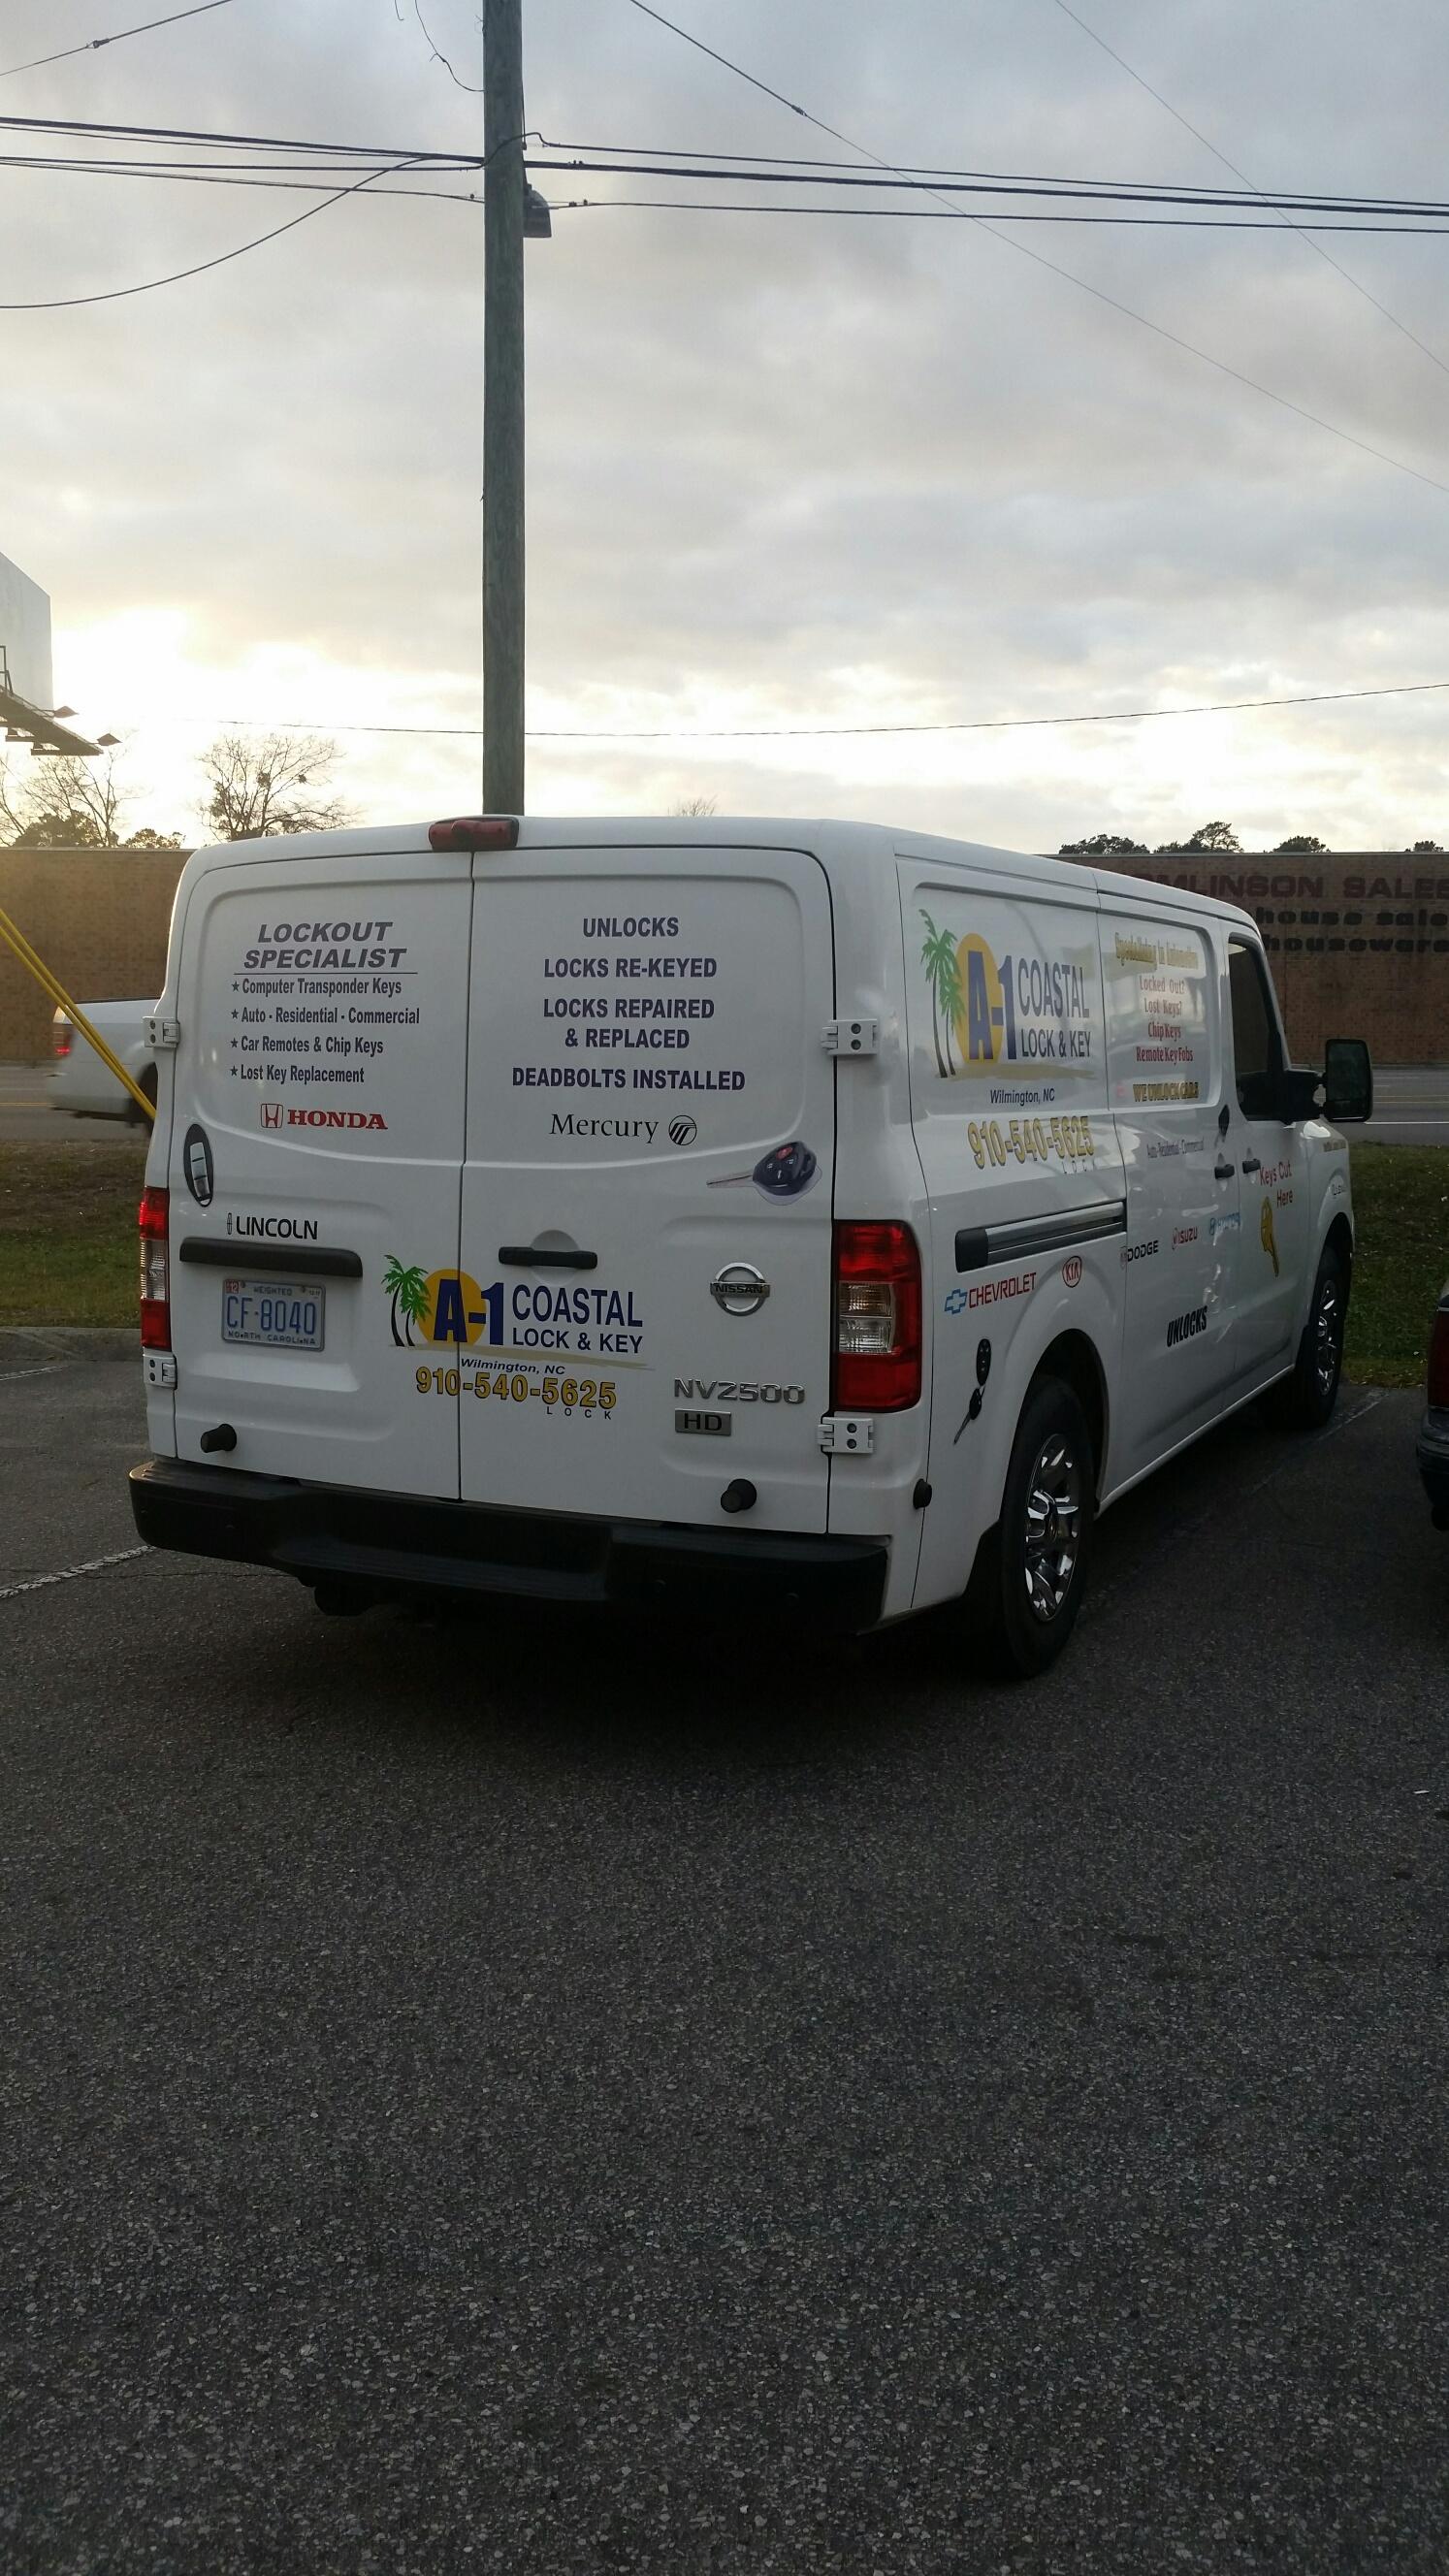 Emergency Locksmith Services Carolina Beach NC